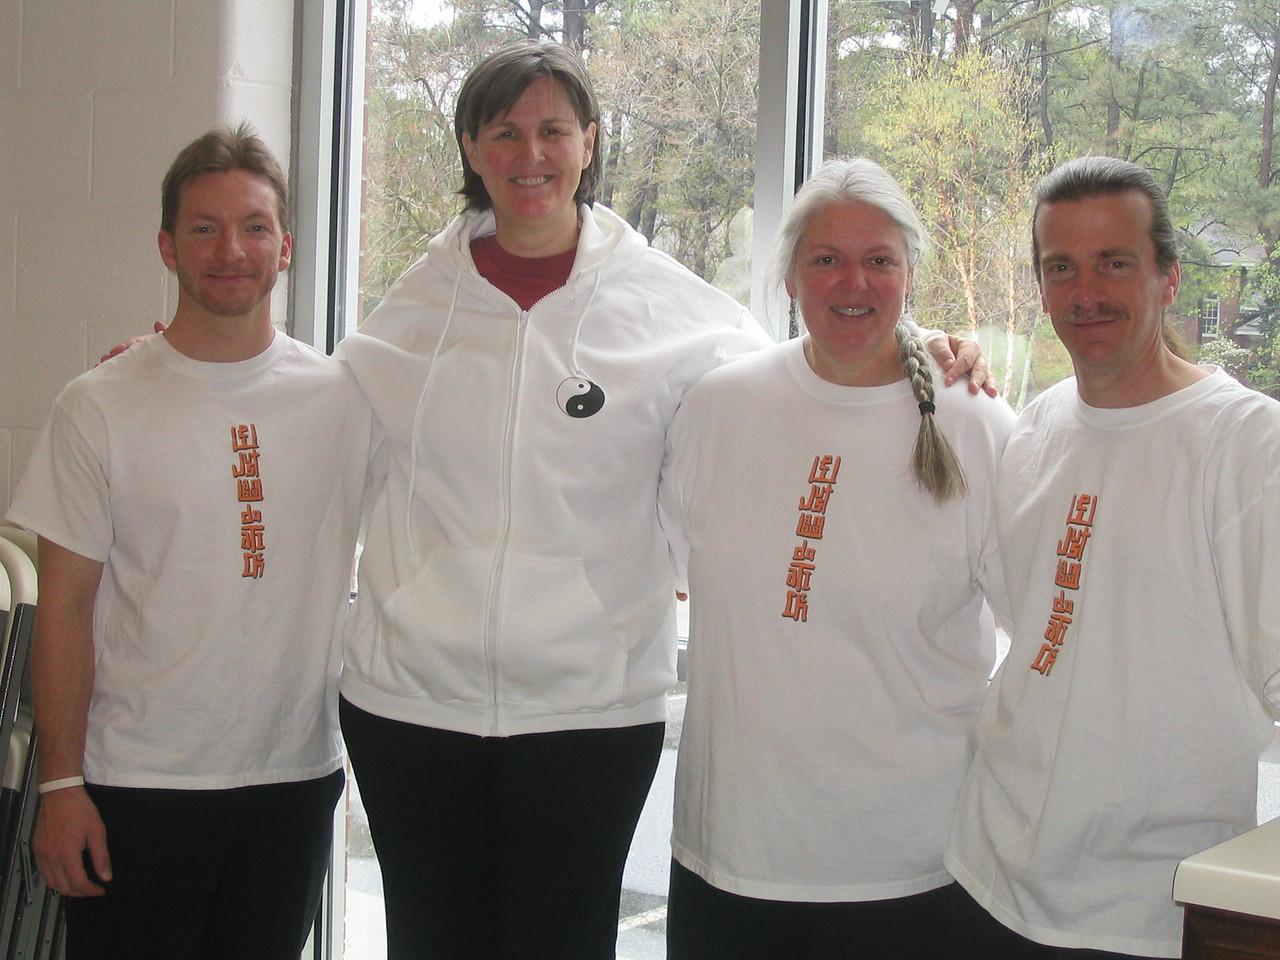 New Dragon Graduates<br /> Lt - Rt = Nik Levinsky, Judith Forsyth - Teacher, Elise Wolf and Tom Wolf<br /> Graduated 11-01-06